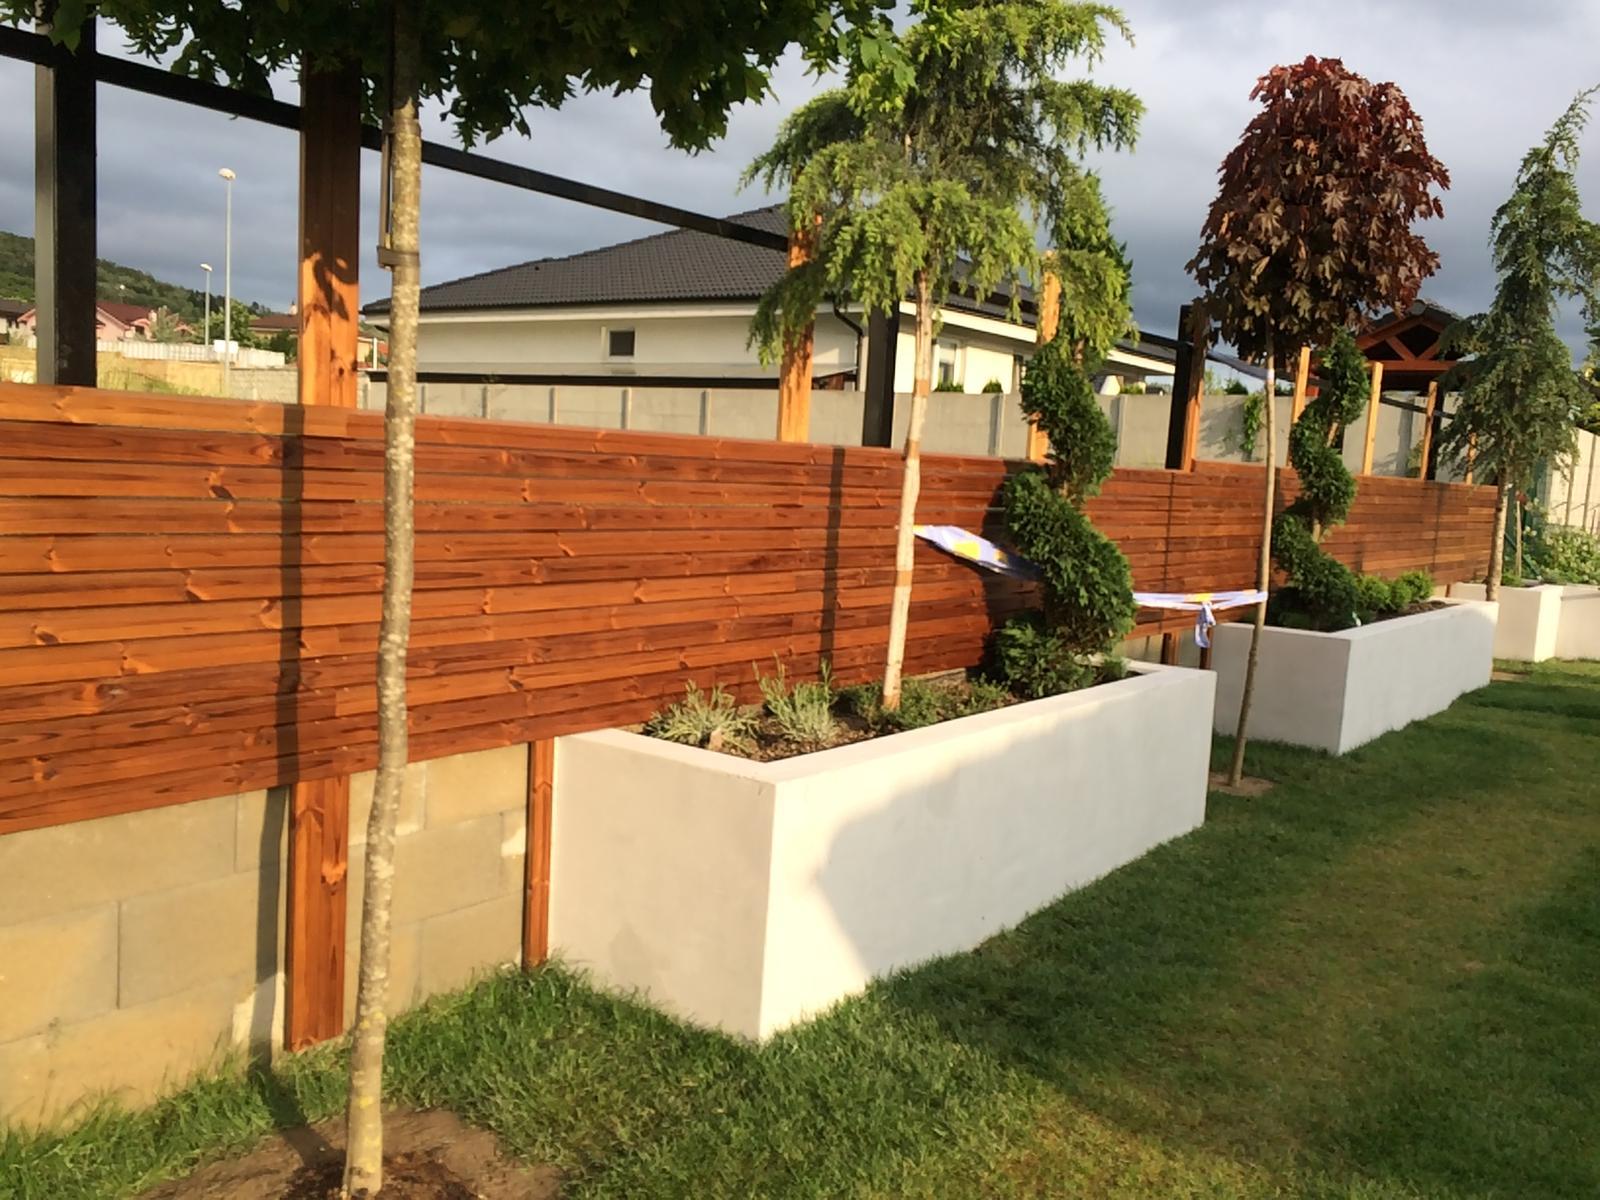 Zahradka - Obrázok č. 34